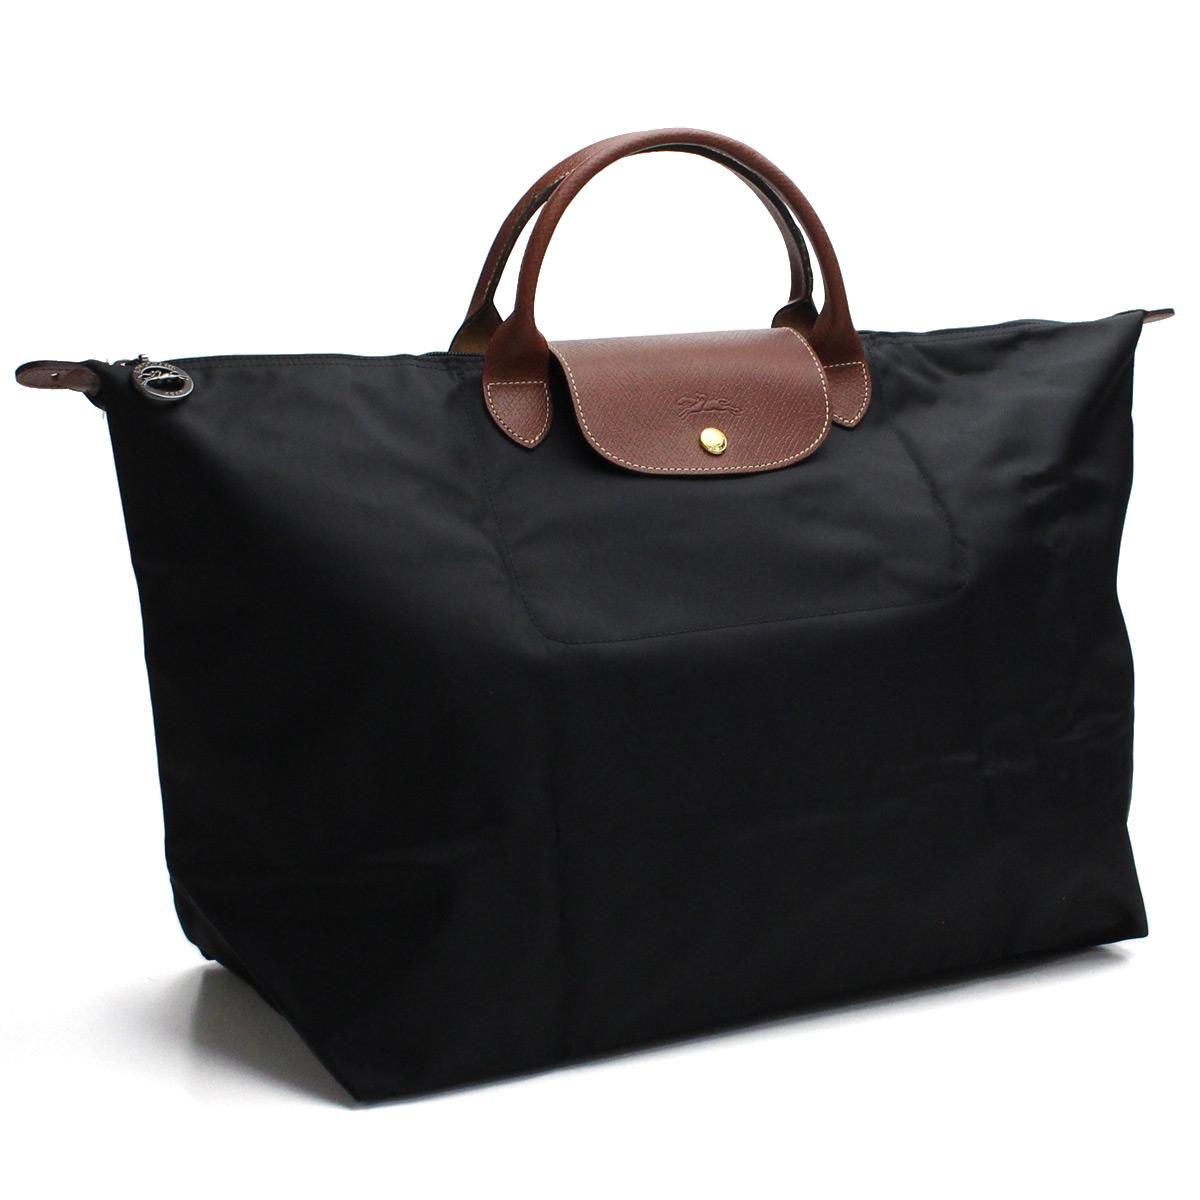 31a8038b687 Bighit The total brand wholesale  Longchamp (LONGCHAMP) LE PLIAGE  ルプリアージュトラベルバッグ large size 1624 089 001 NOIR(NERO) black